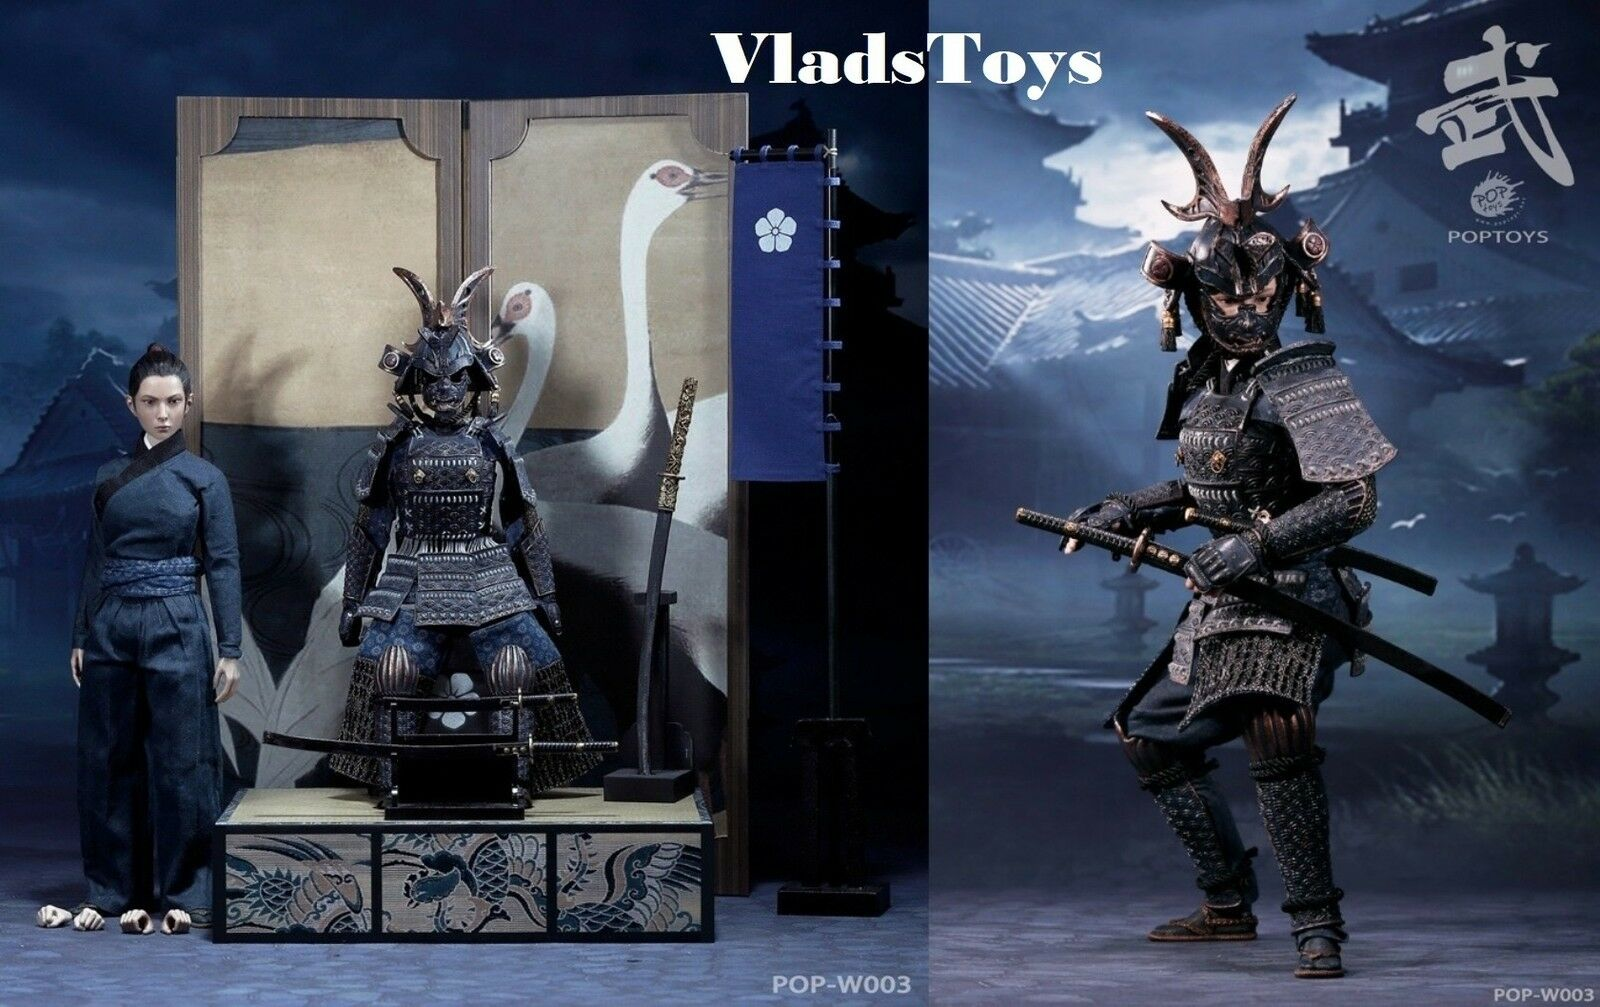 Samuraj Kvinnliga Warriors årgång Armor Deluxe Version Popleksaker 1  6 W003B USA